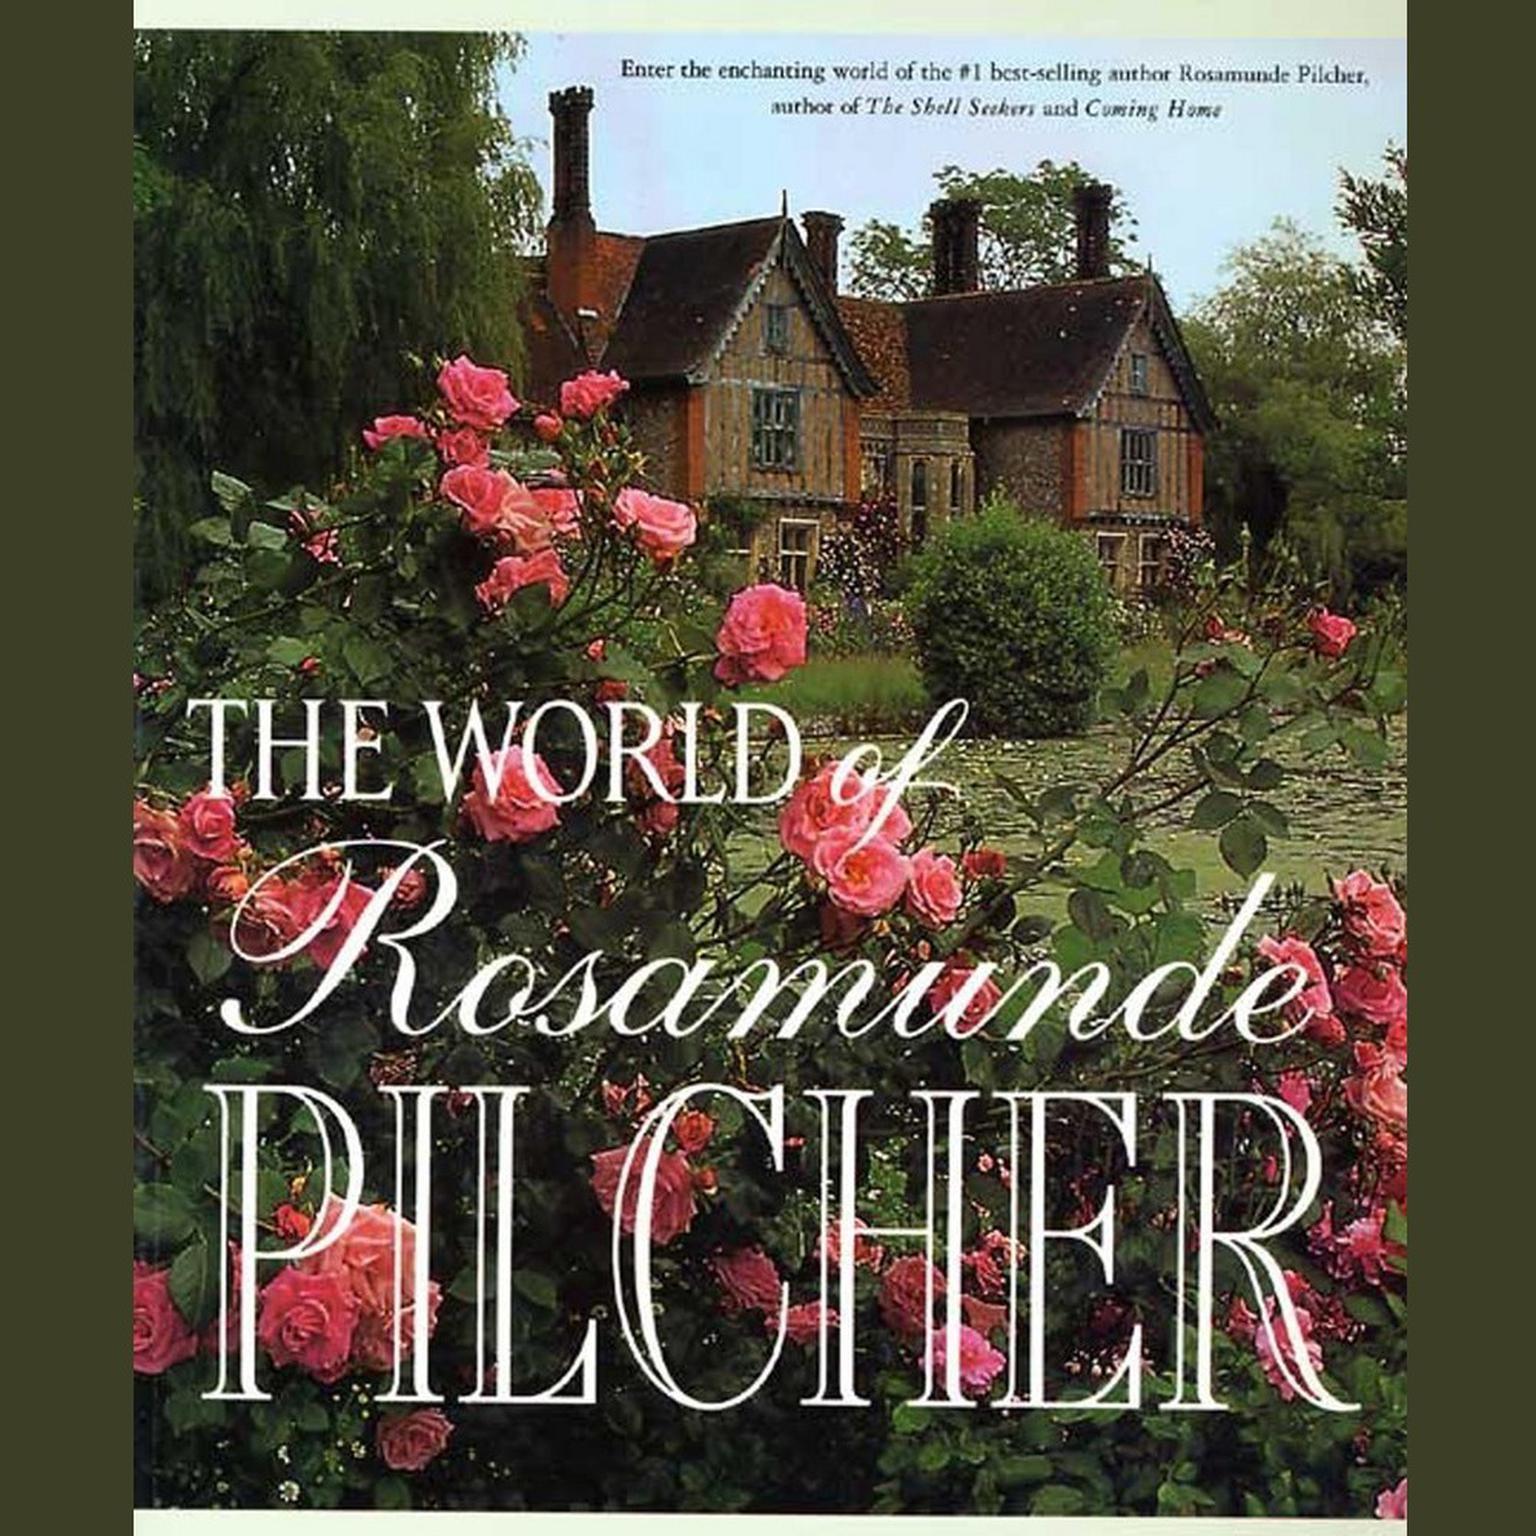 The World of Rosamunde Pilcher Audiobook, by Rosamunde Pilcher